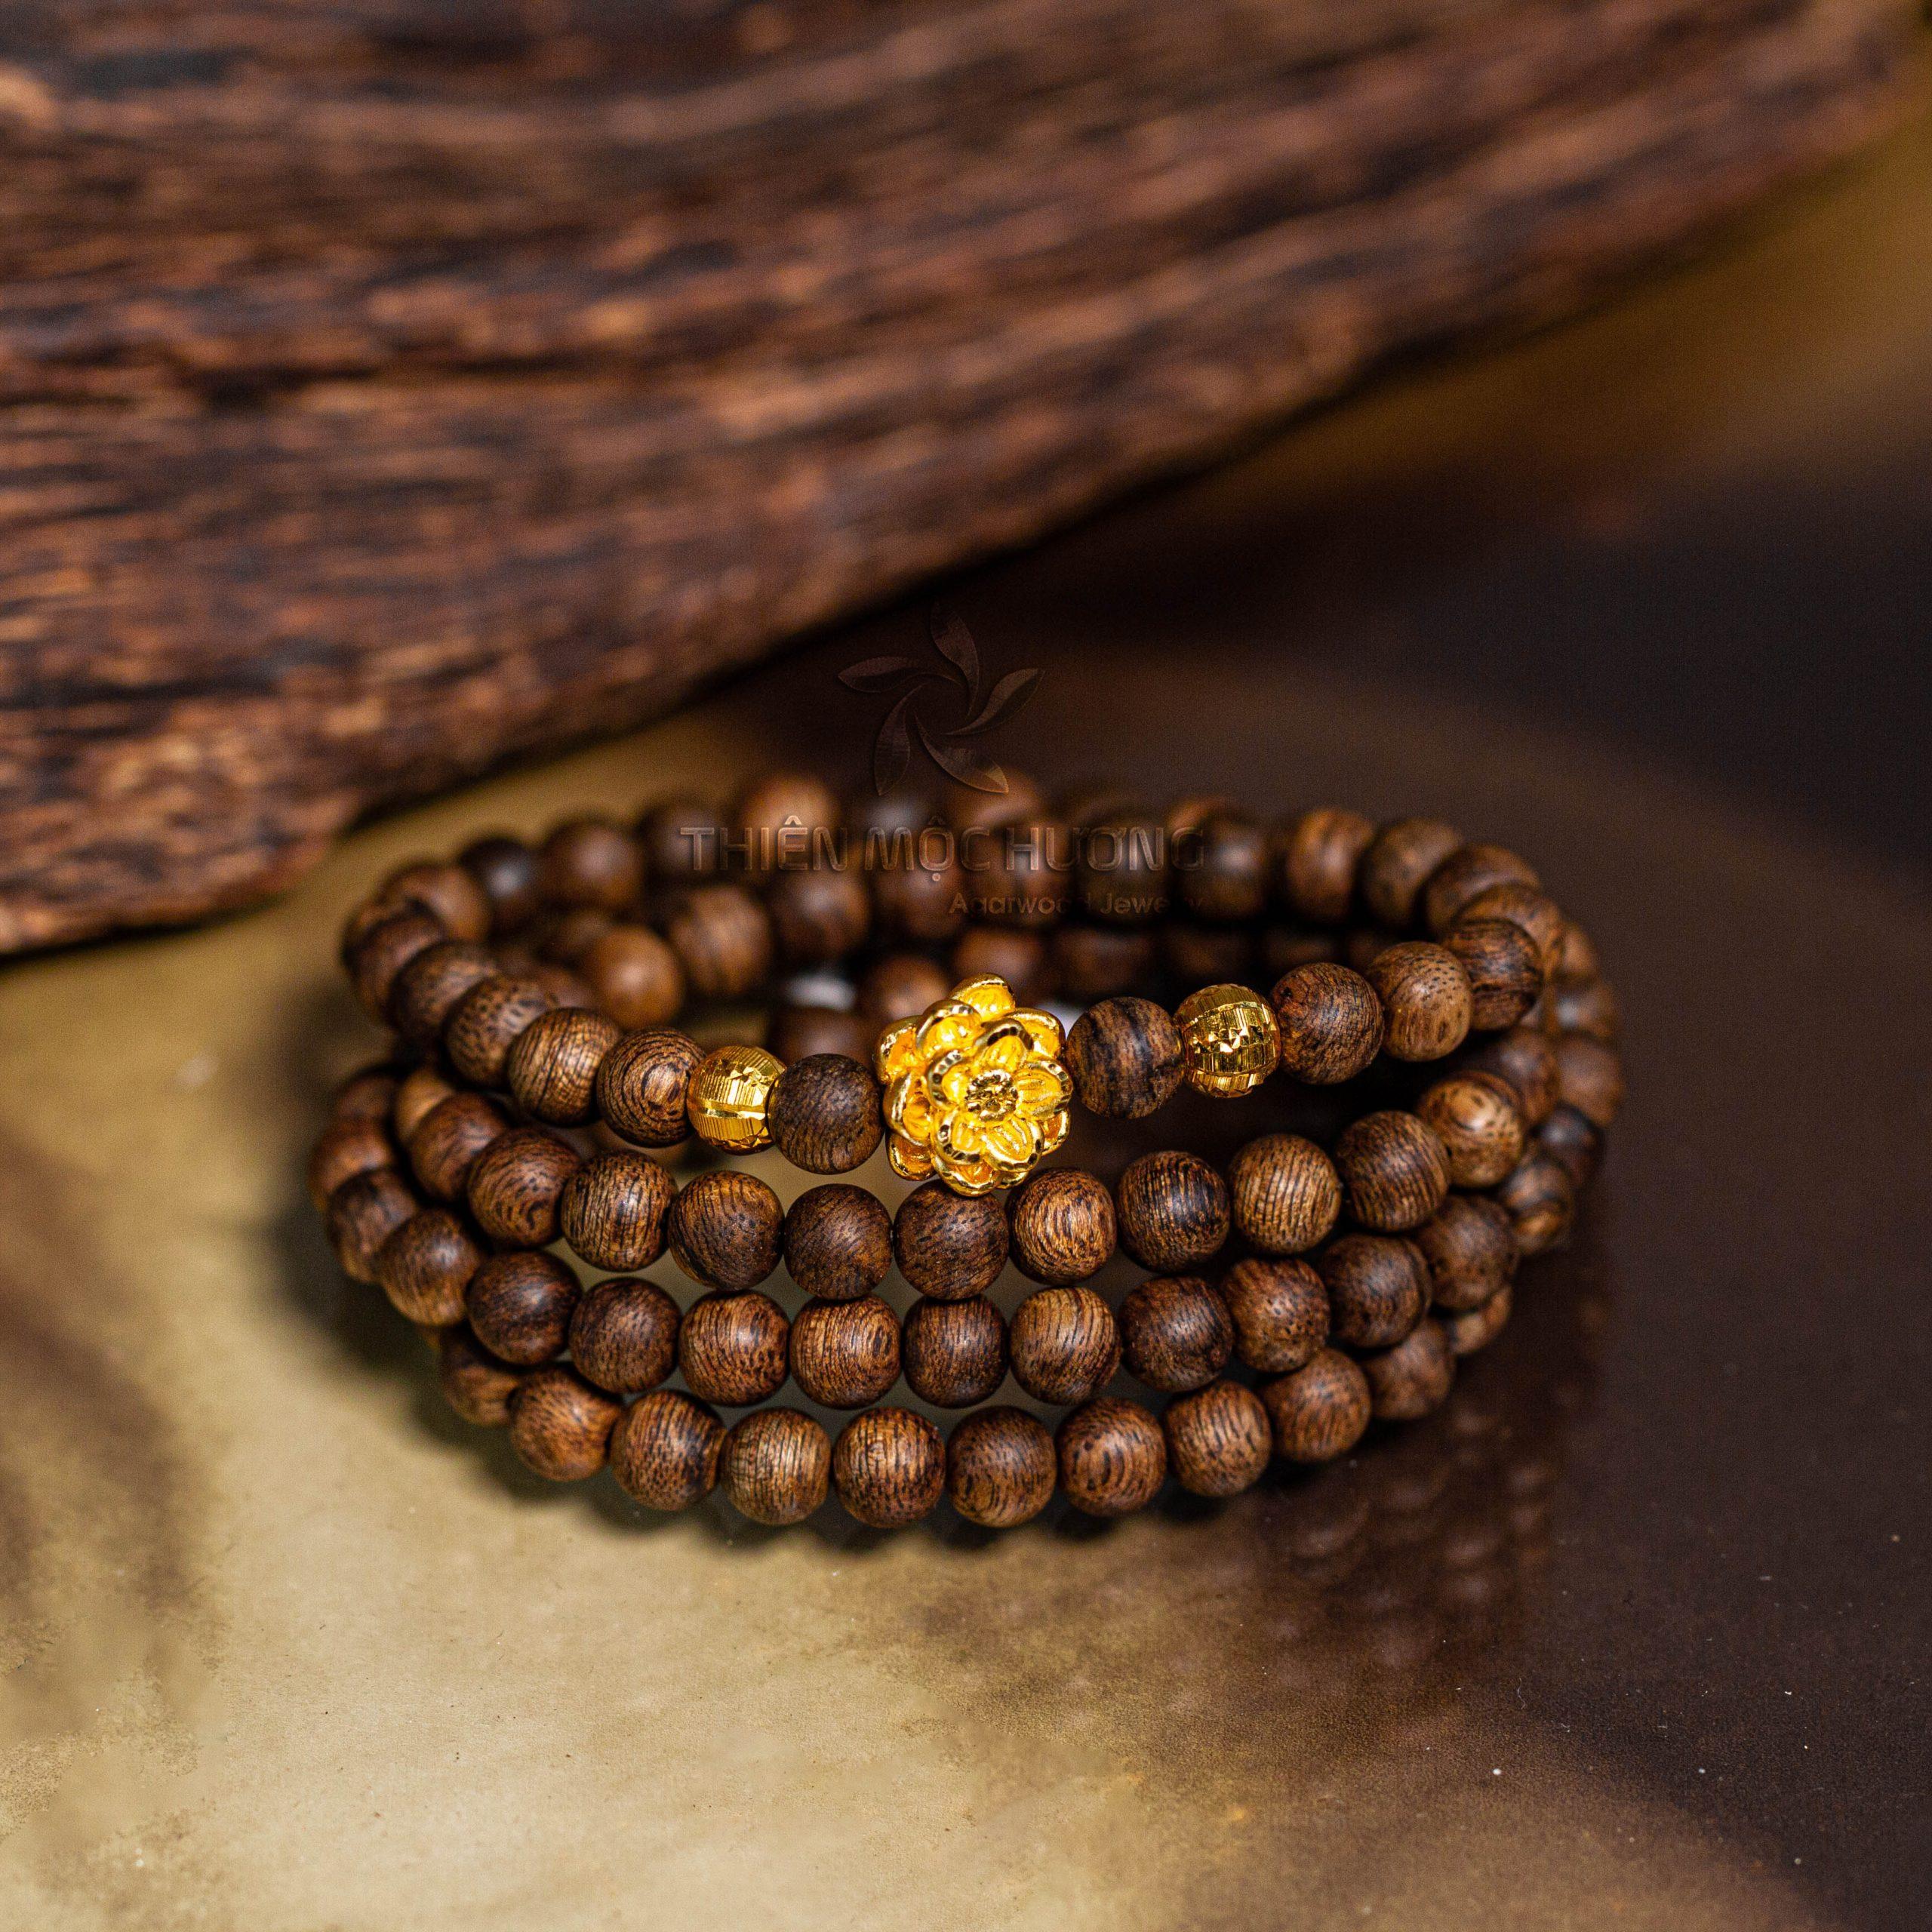 Blossom Philippines agarwood beaded bracelet with 24k gold charm